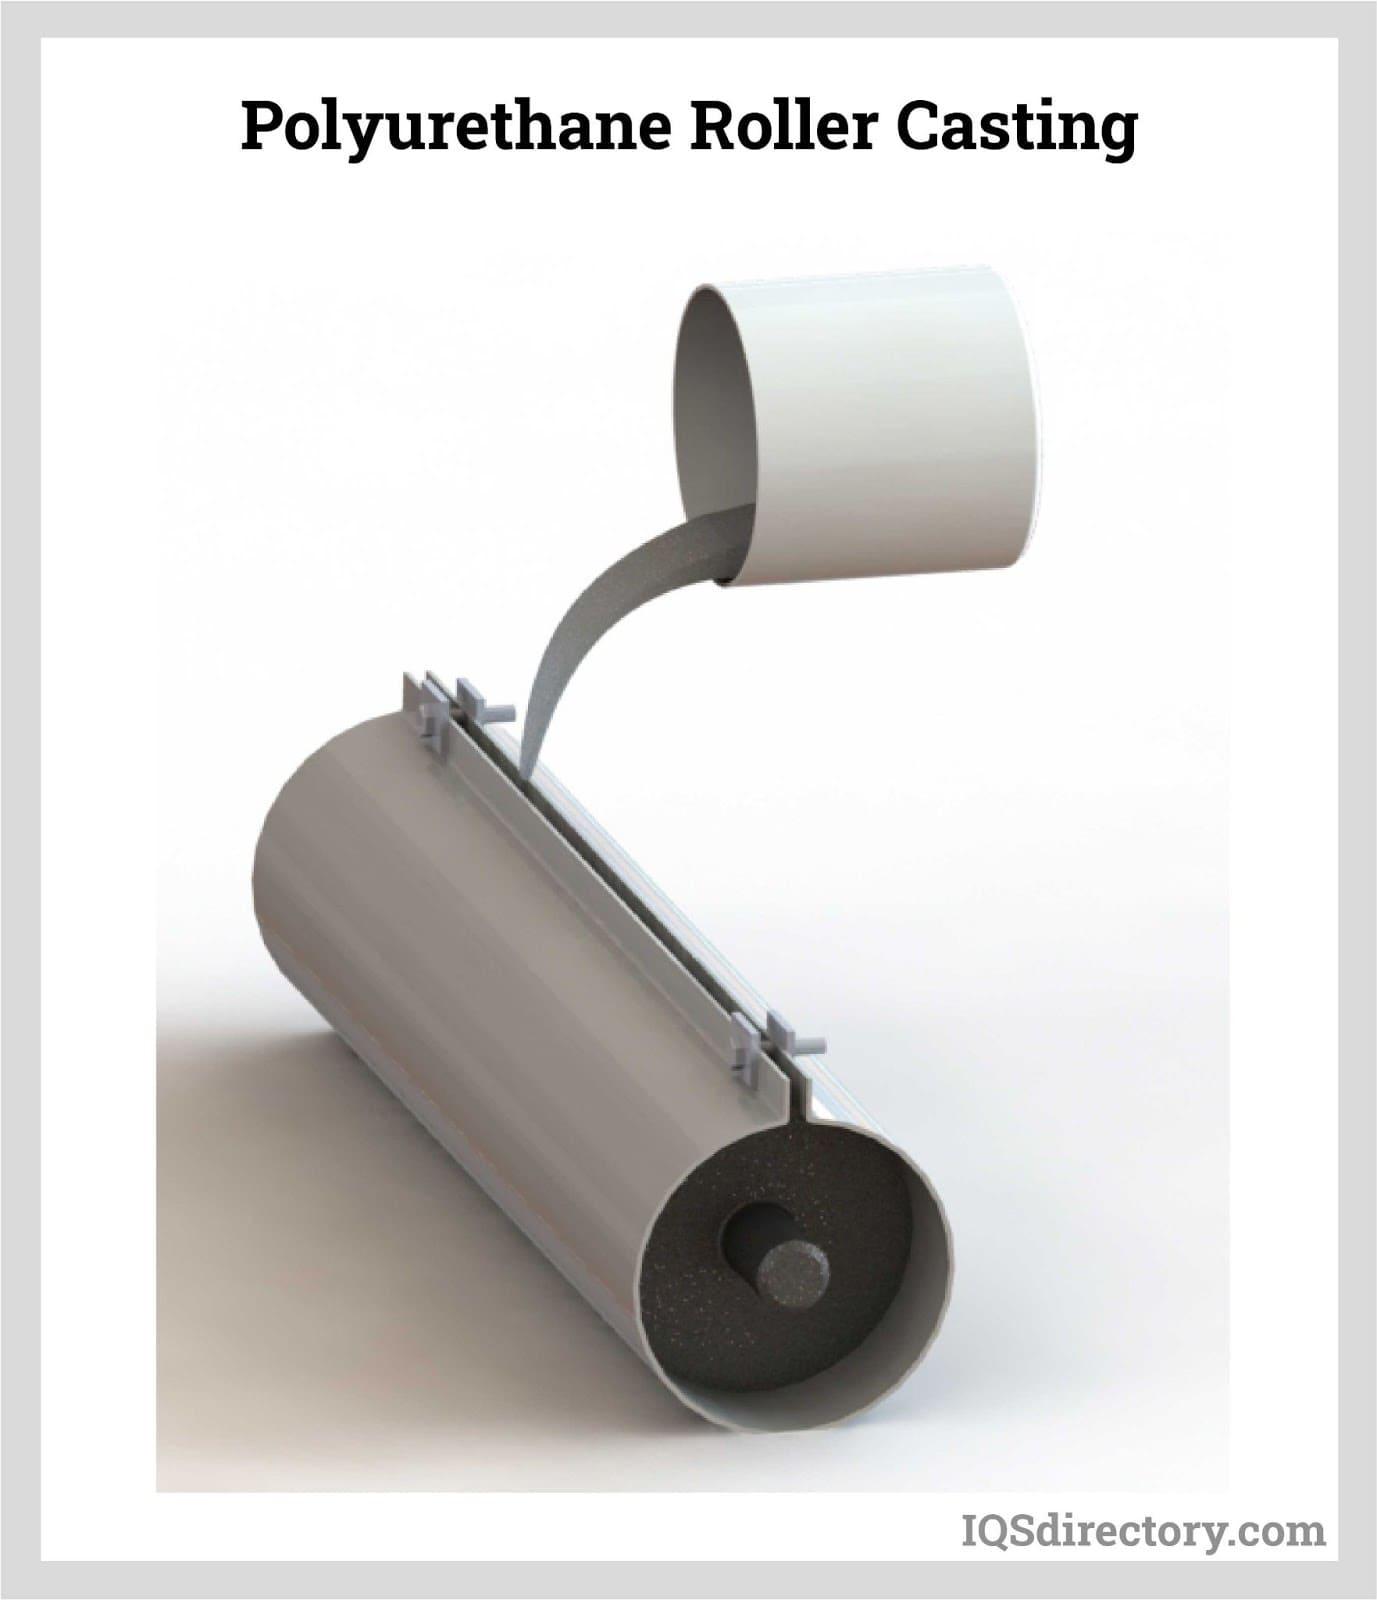 Polyurethane Roller Casting